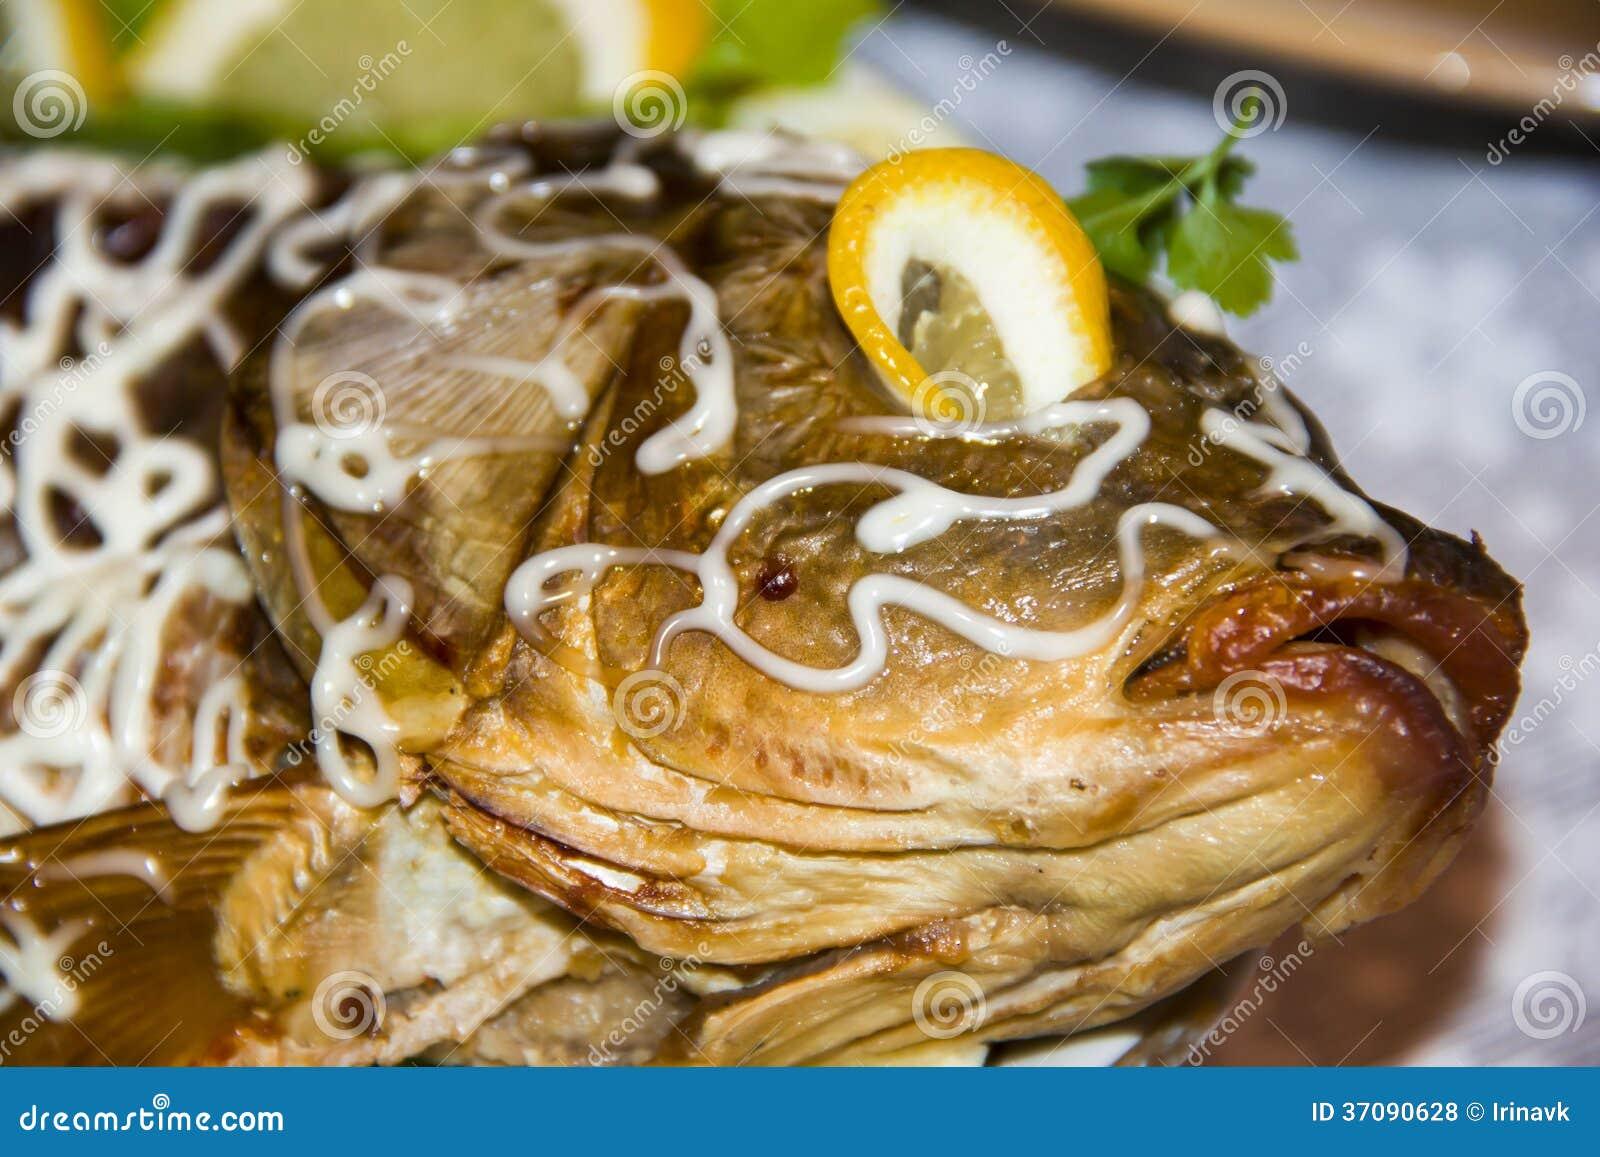 Gefilte fish royalty free stock photos image 37090628 for Jewish fish dish